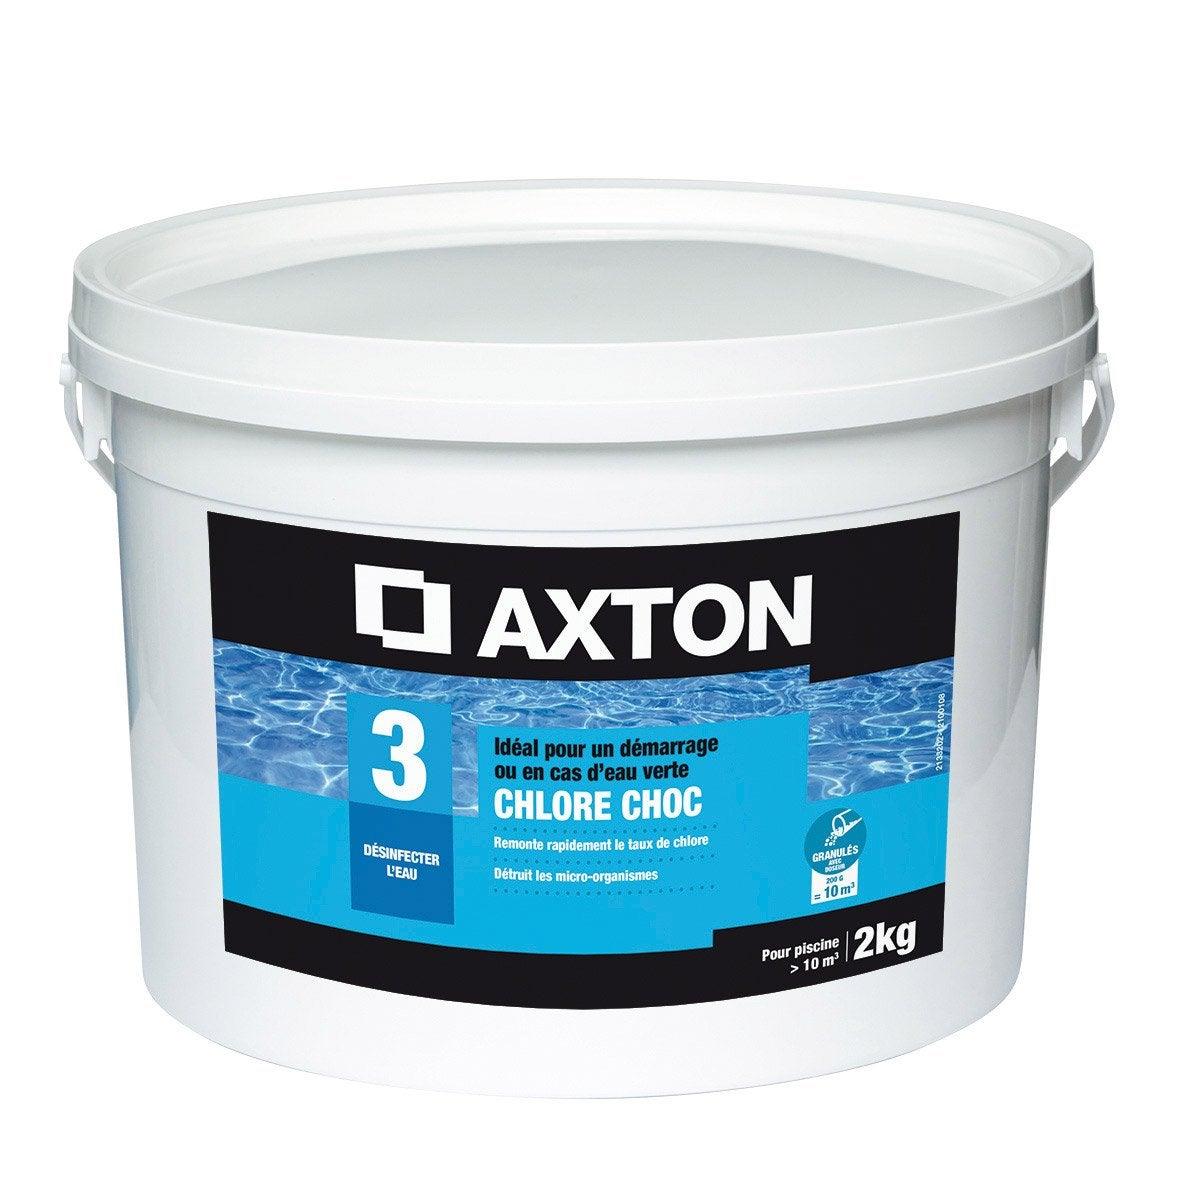 Chlore choc piscine axton granul 2 kg leroy merlin - Granule leroy merlin ...